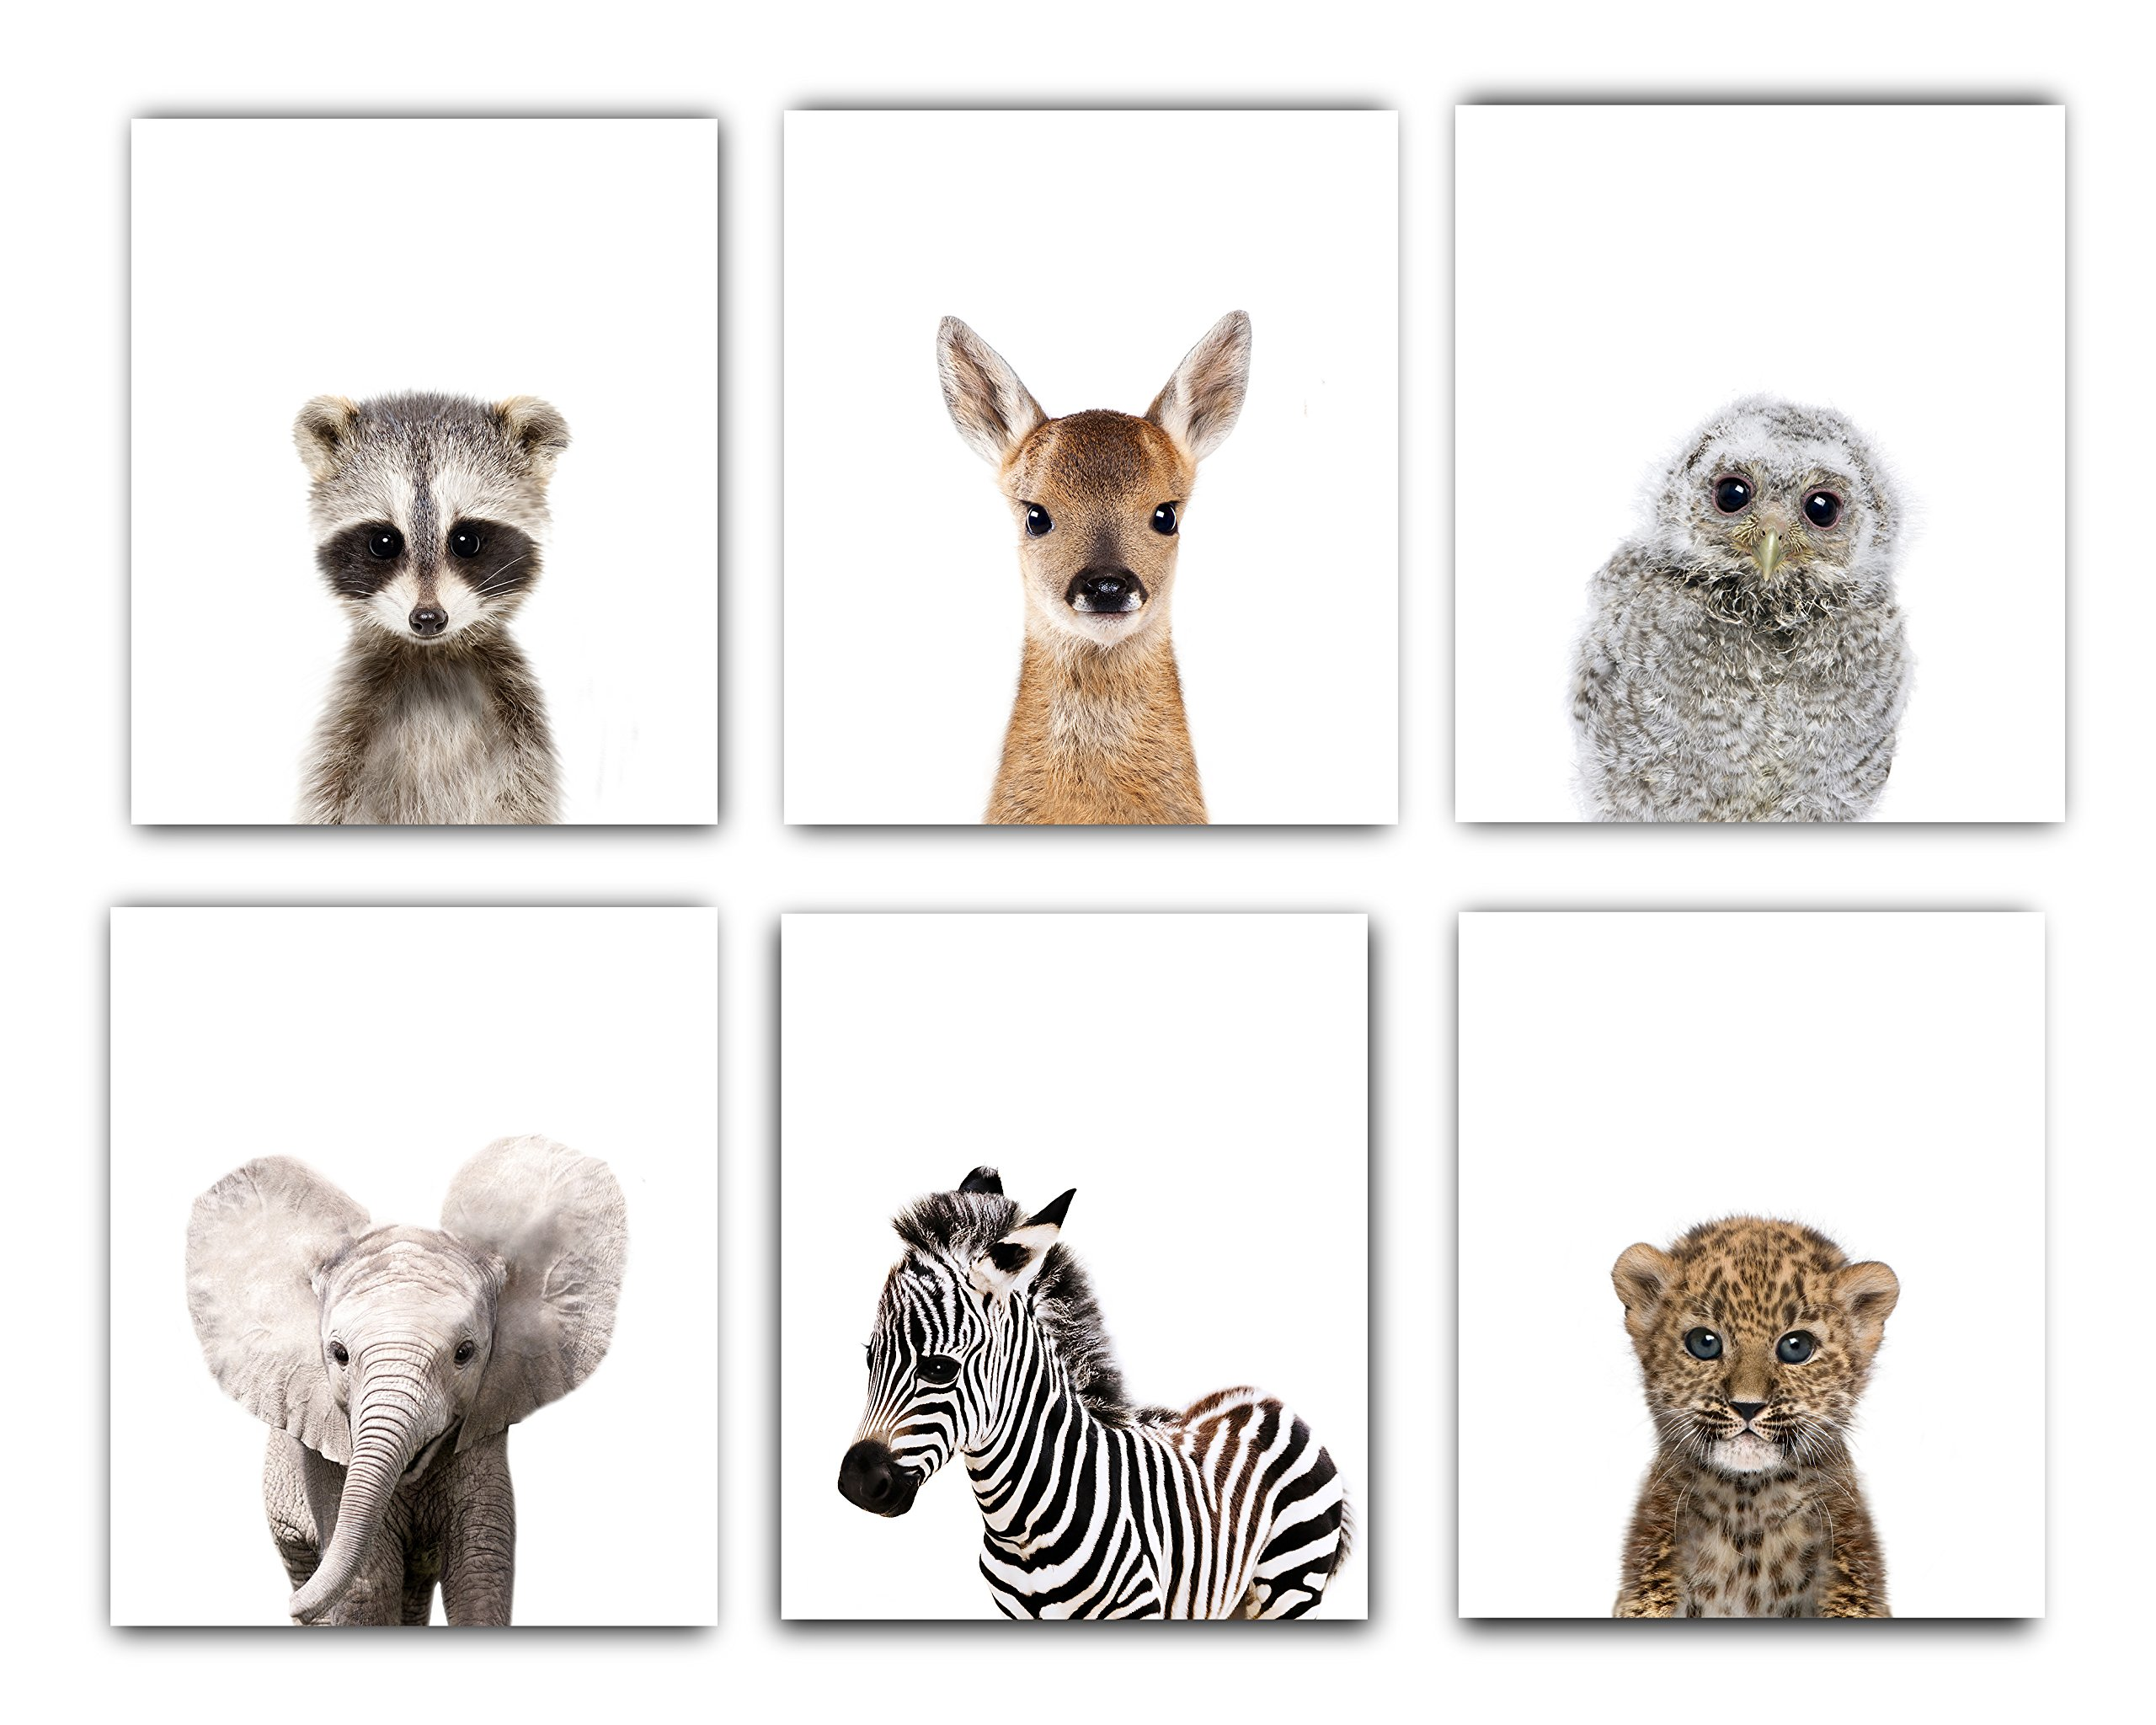 Woodland Nursery Wall Decor | Baby Room Decor Animal Nursery Pictures 8x10 | Baby Nursery Decor Cute Animal Photography Wall Prints| Set of 6 Unframed Prints for Baby Boys & Girls